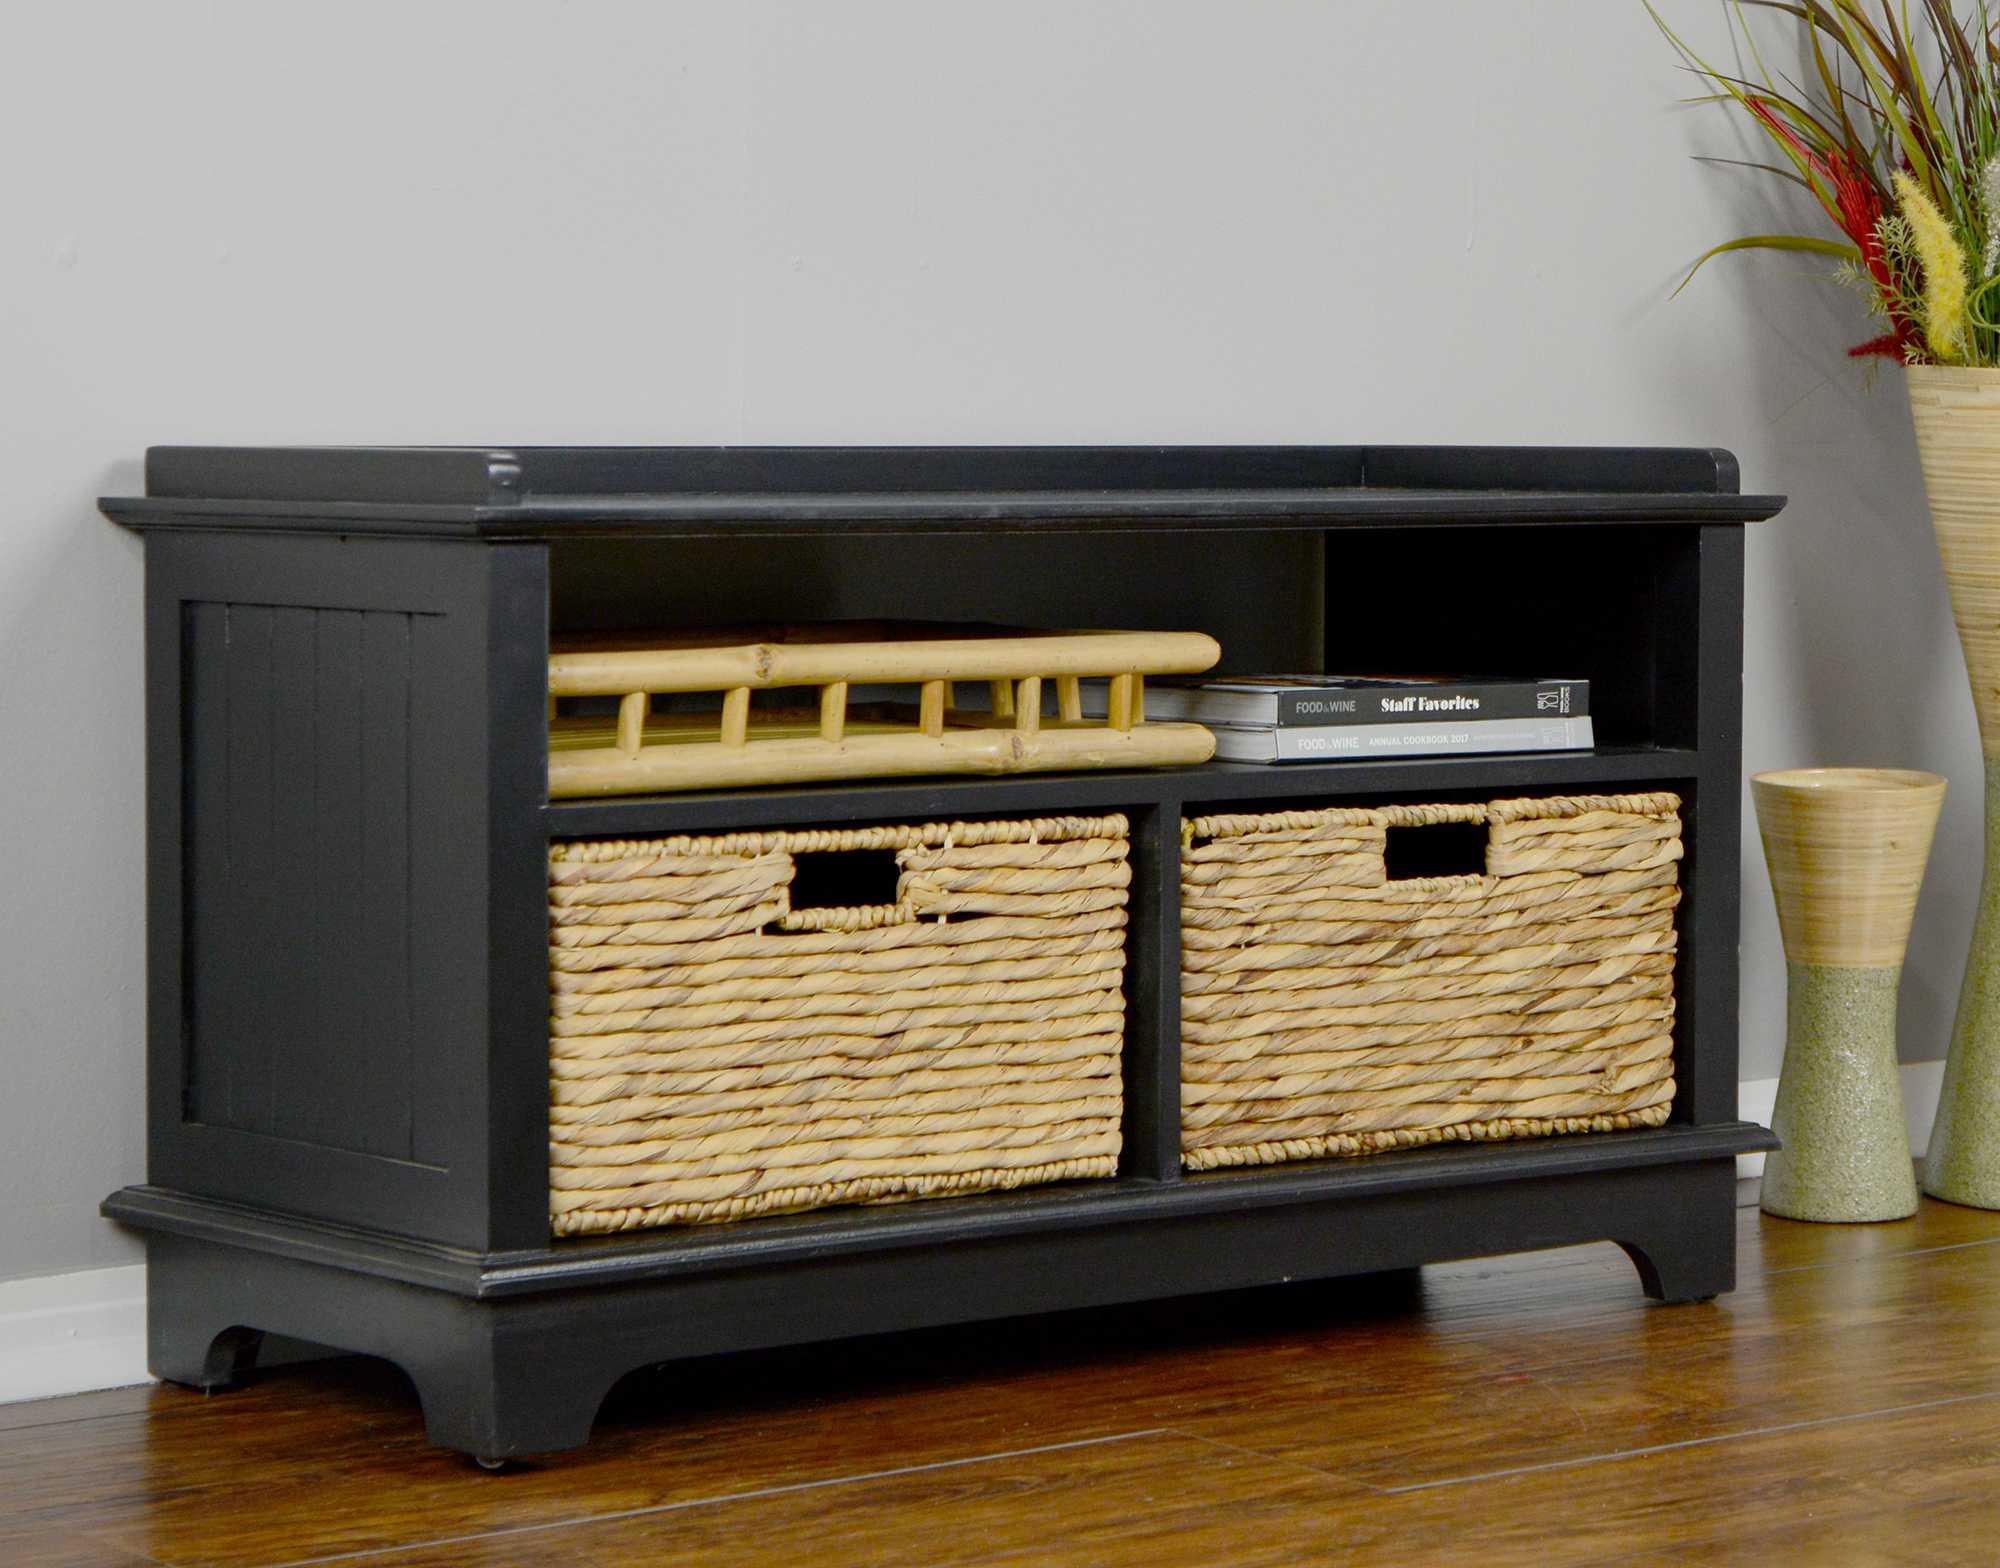 "38.25"" X 15.75"" X 21.75"" Black Wood MDF Water Hyacinth Entertainment Cabinet with Hyacinth Storage Baskets"